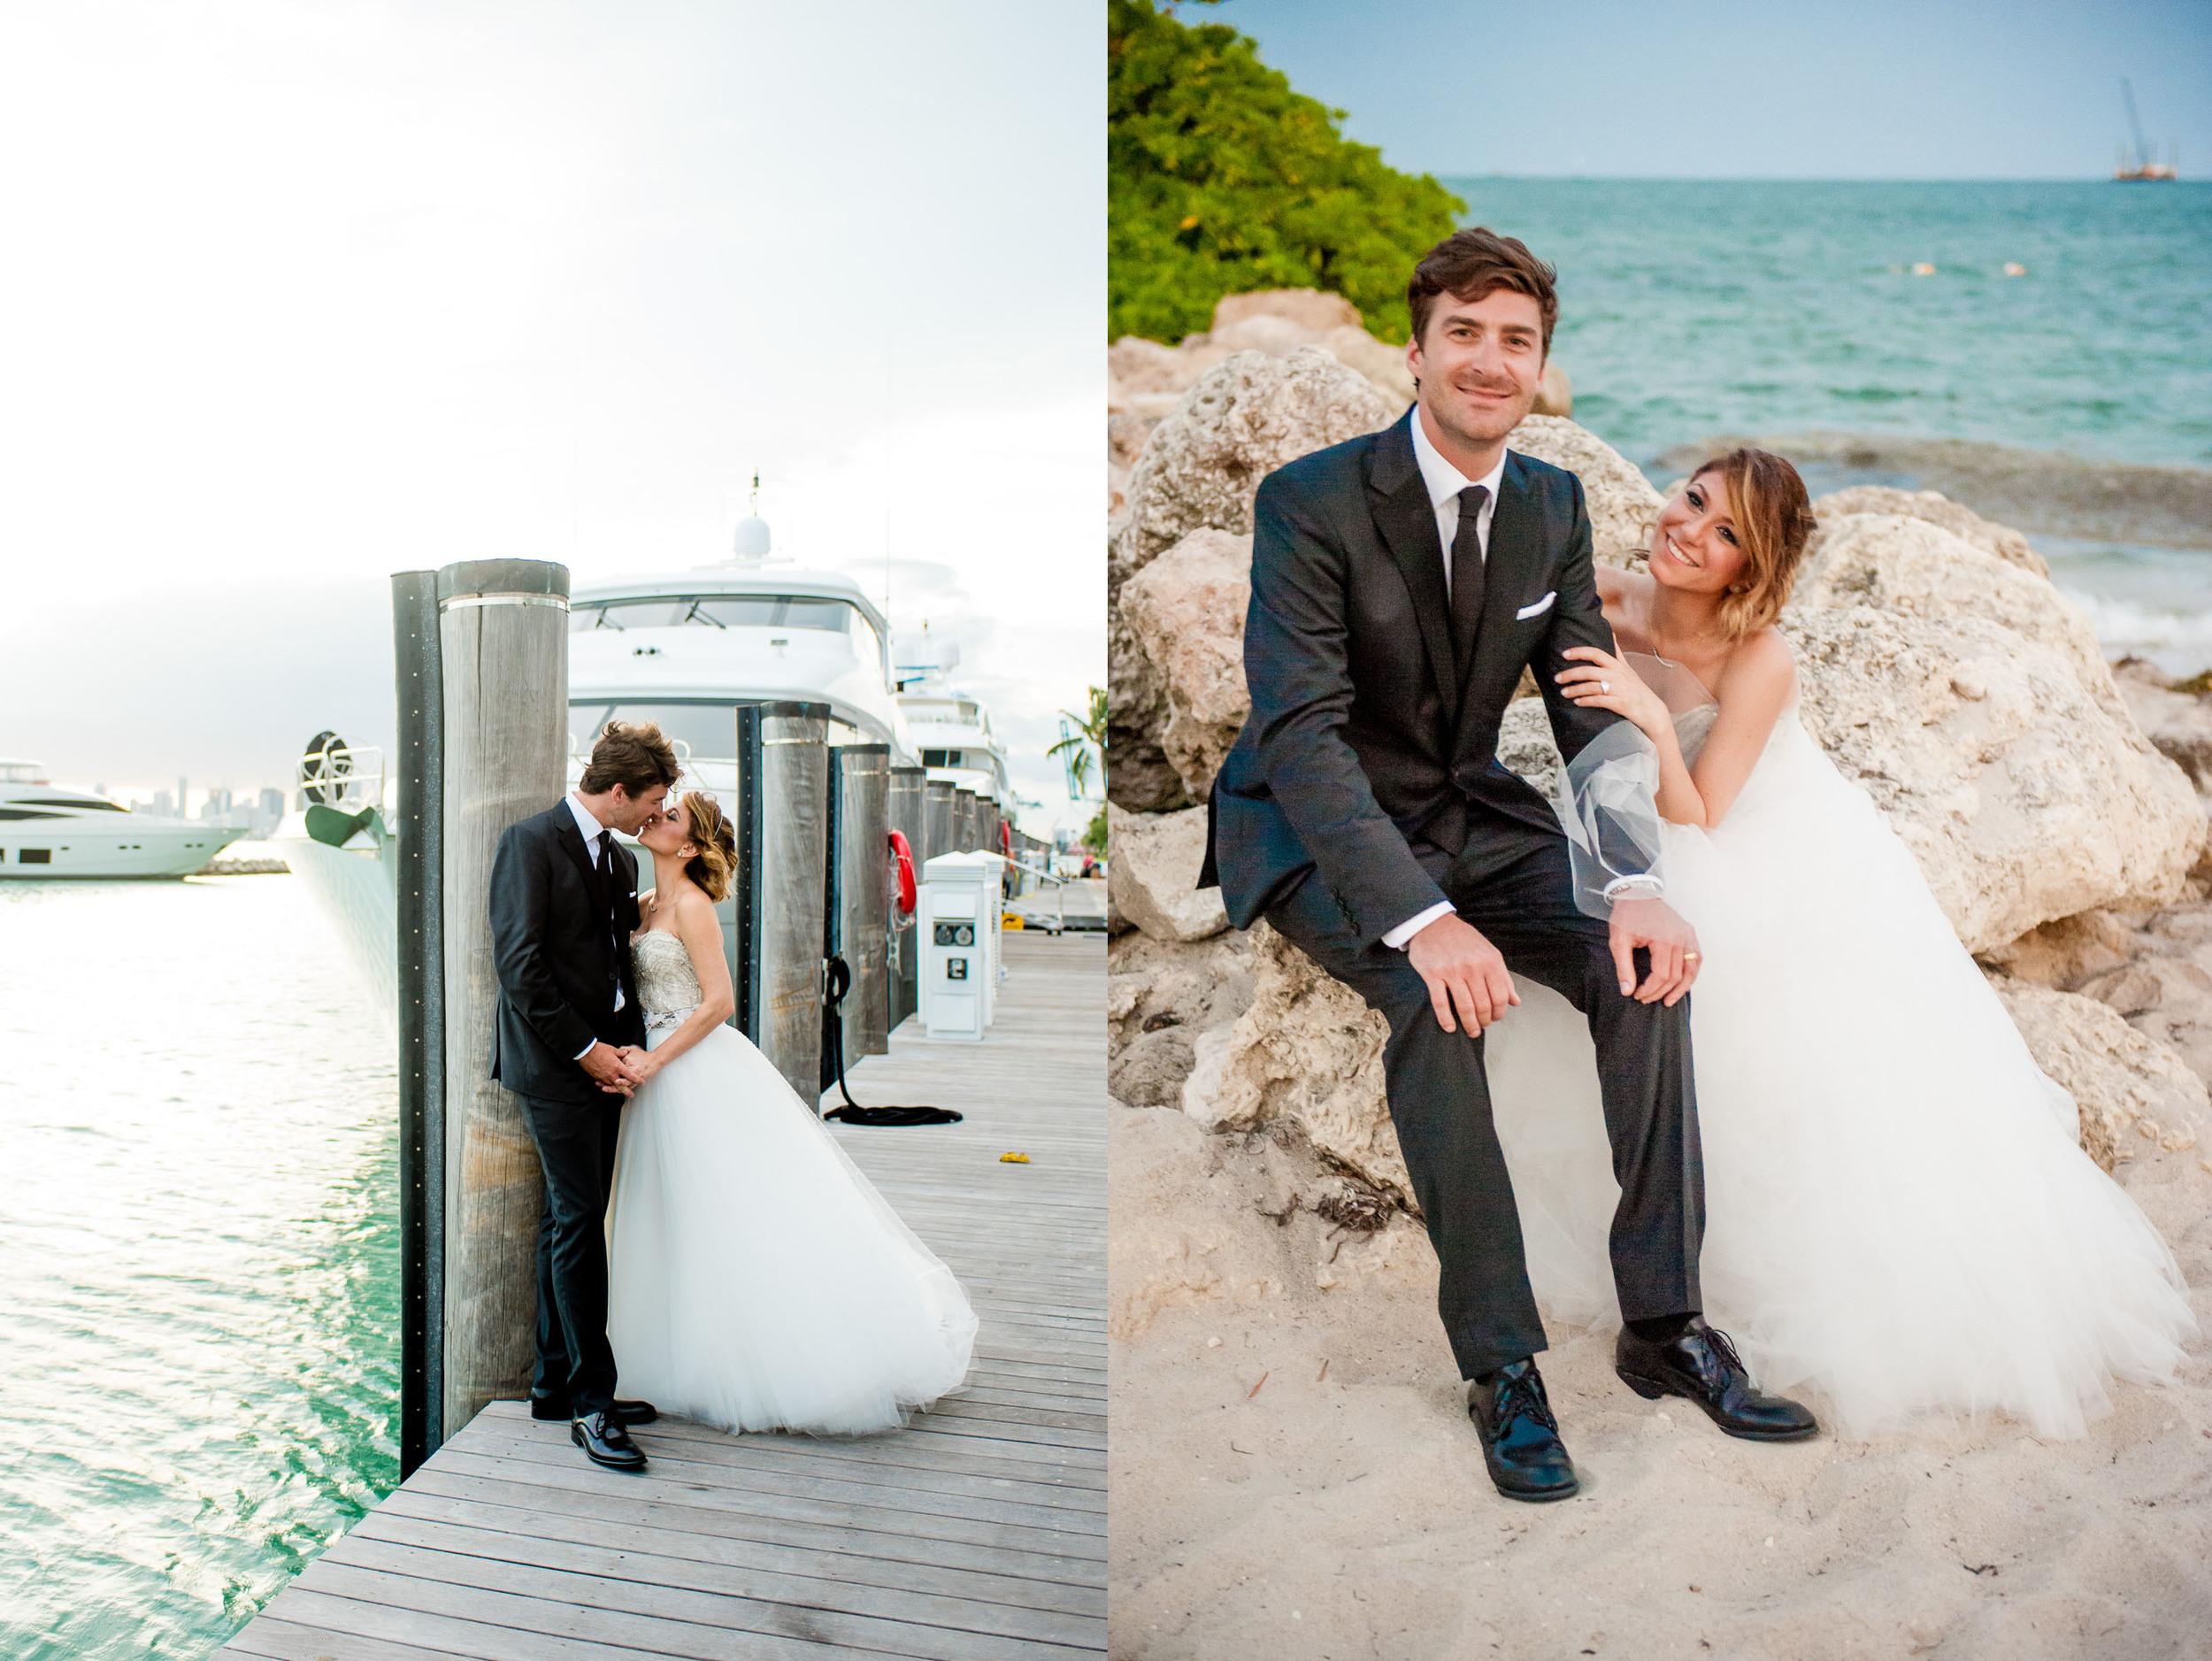 fisher-island-wedding-042.jpg